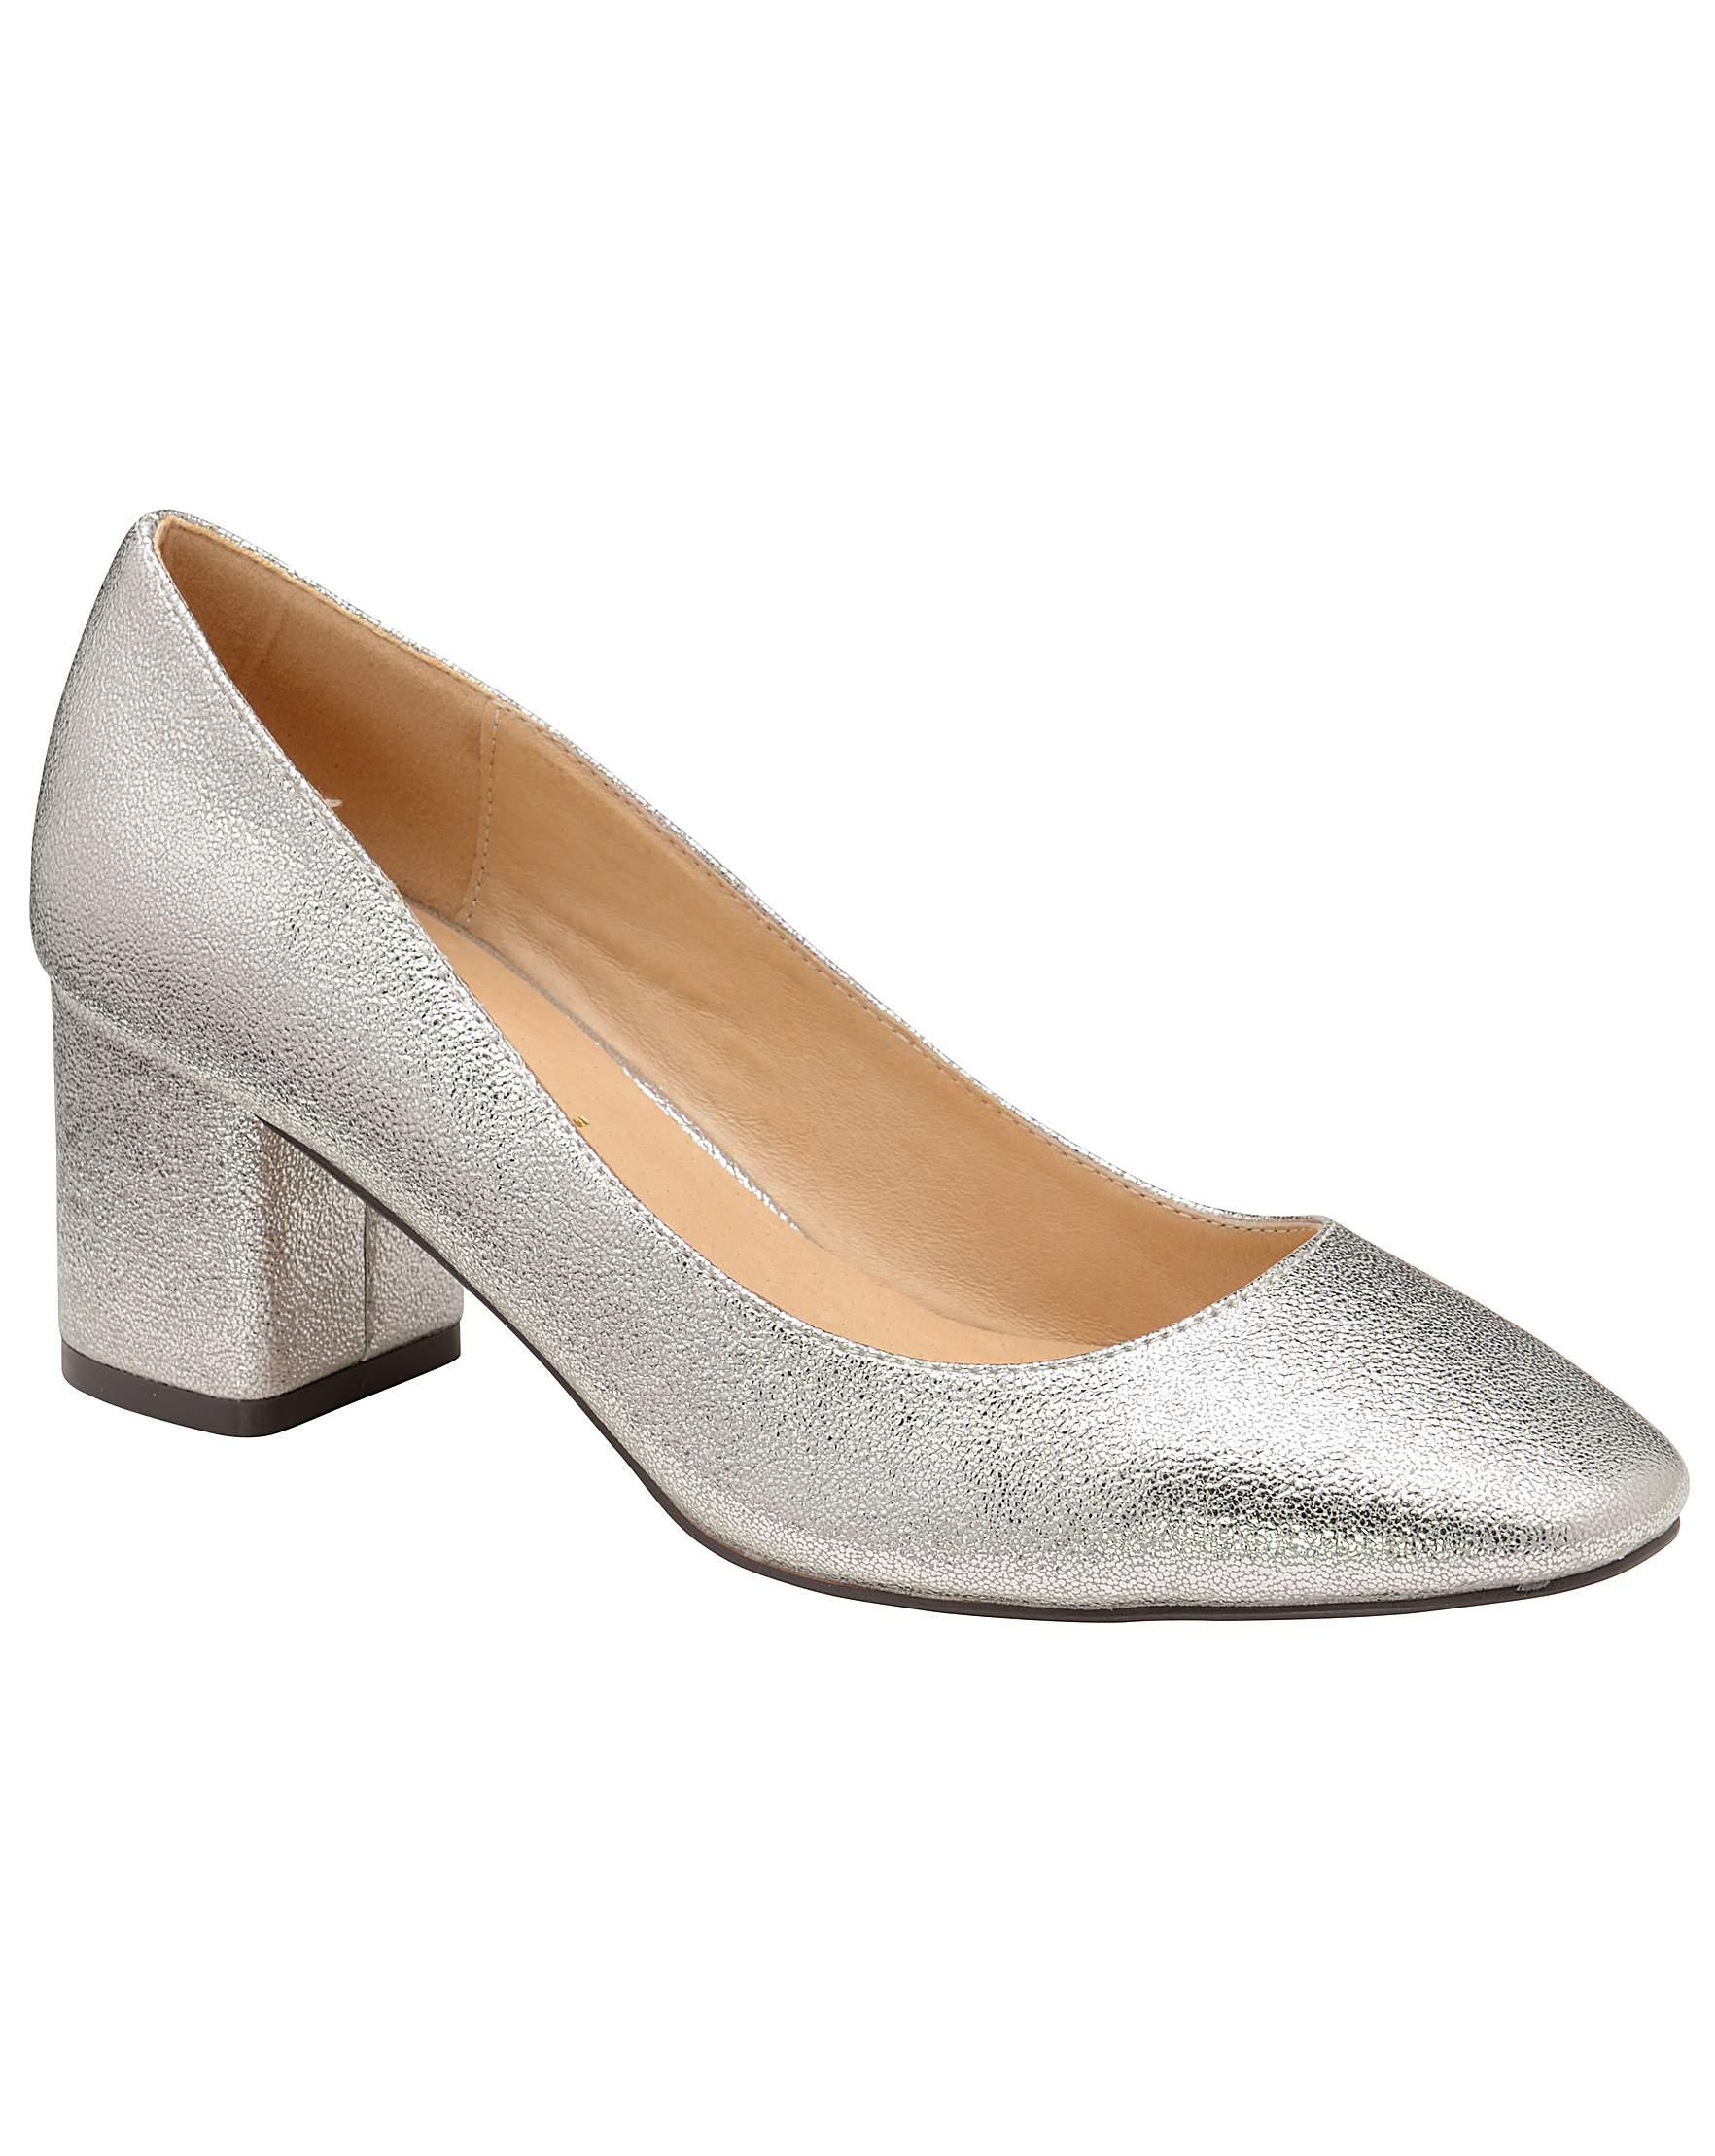 af7e467b89e6 Ravel Barton Block Heel Court Shoes